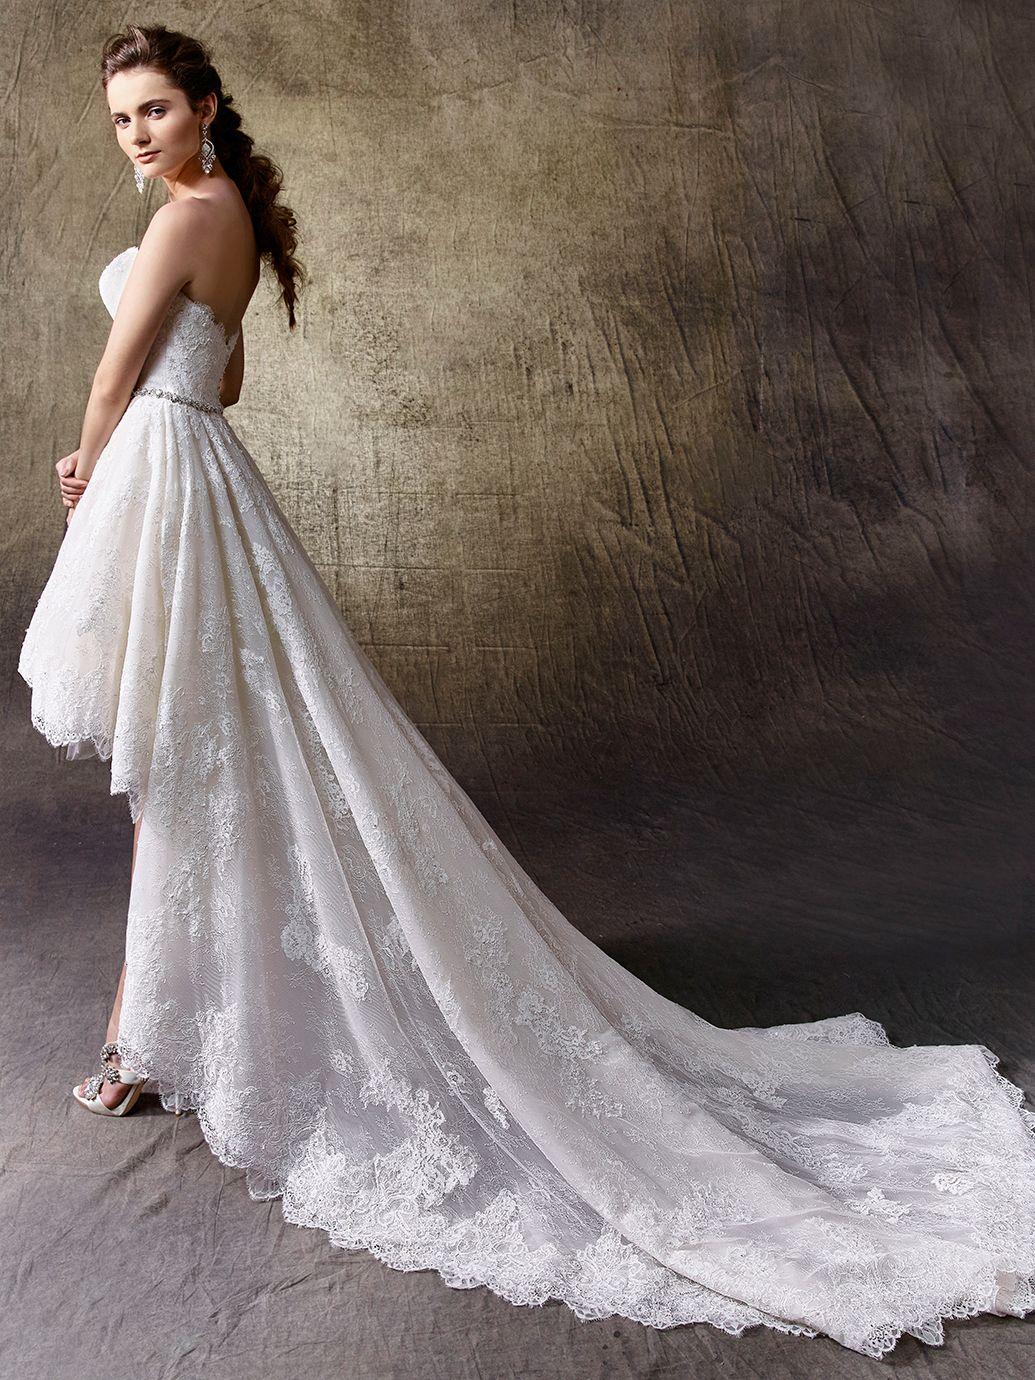 Kanten jurk voor kort achter lang